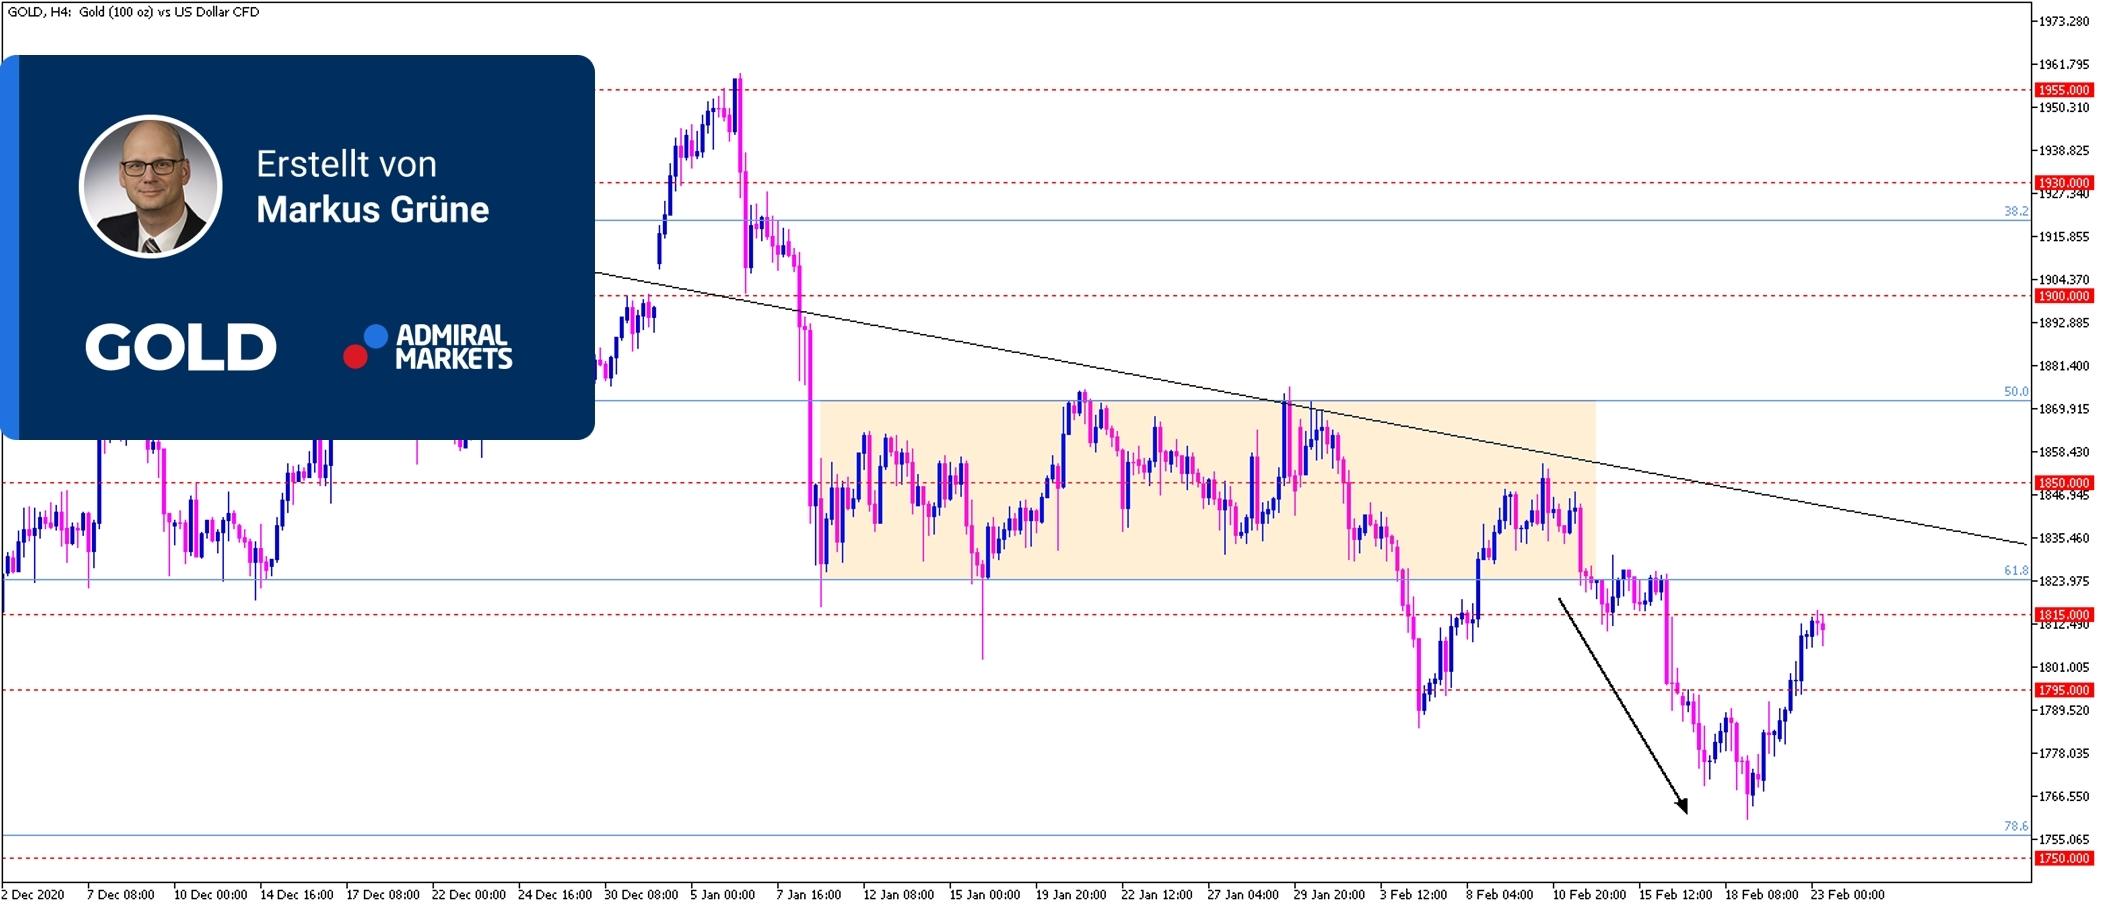 Gold-Analyse-Steigende-Anleiherenditen-belasten-den-Goldpreis-Kommentar-Admiral-Markets-GodmodeTrader.de-1